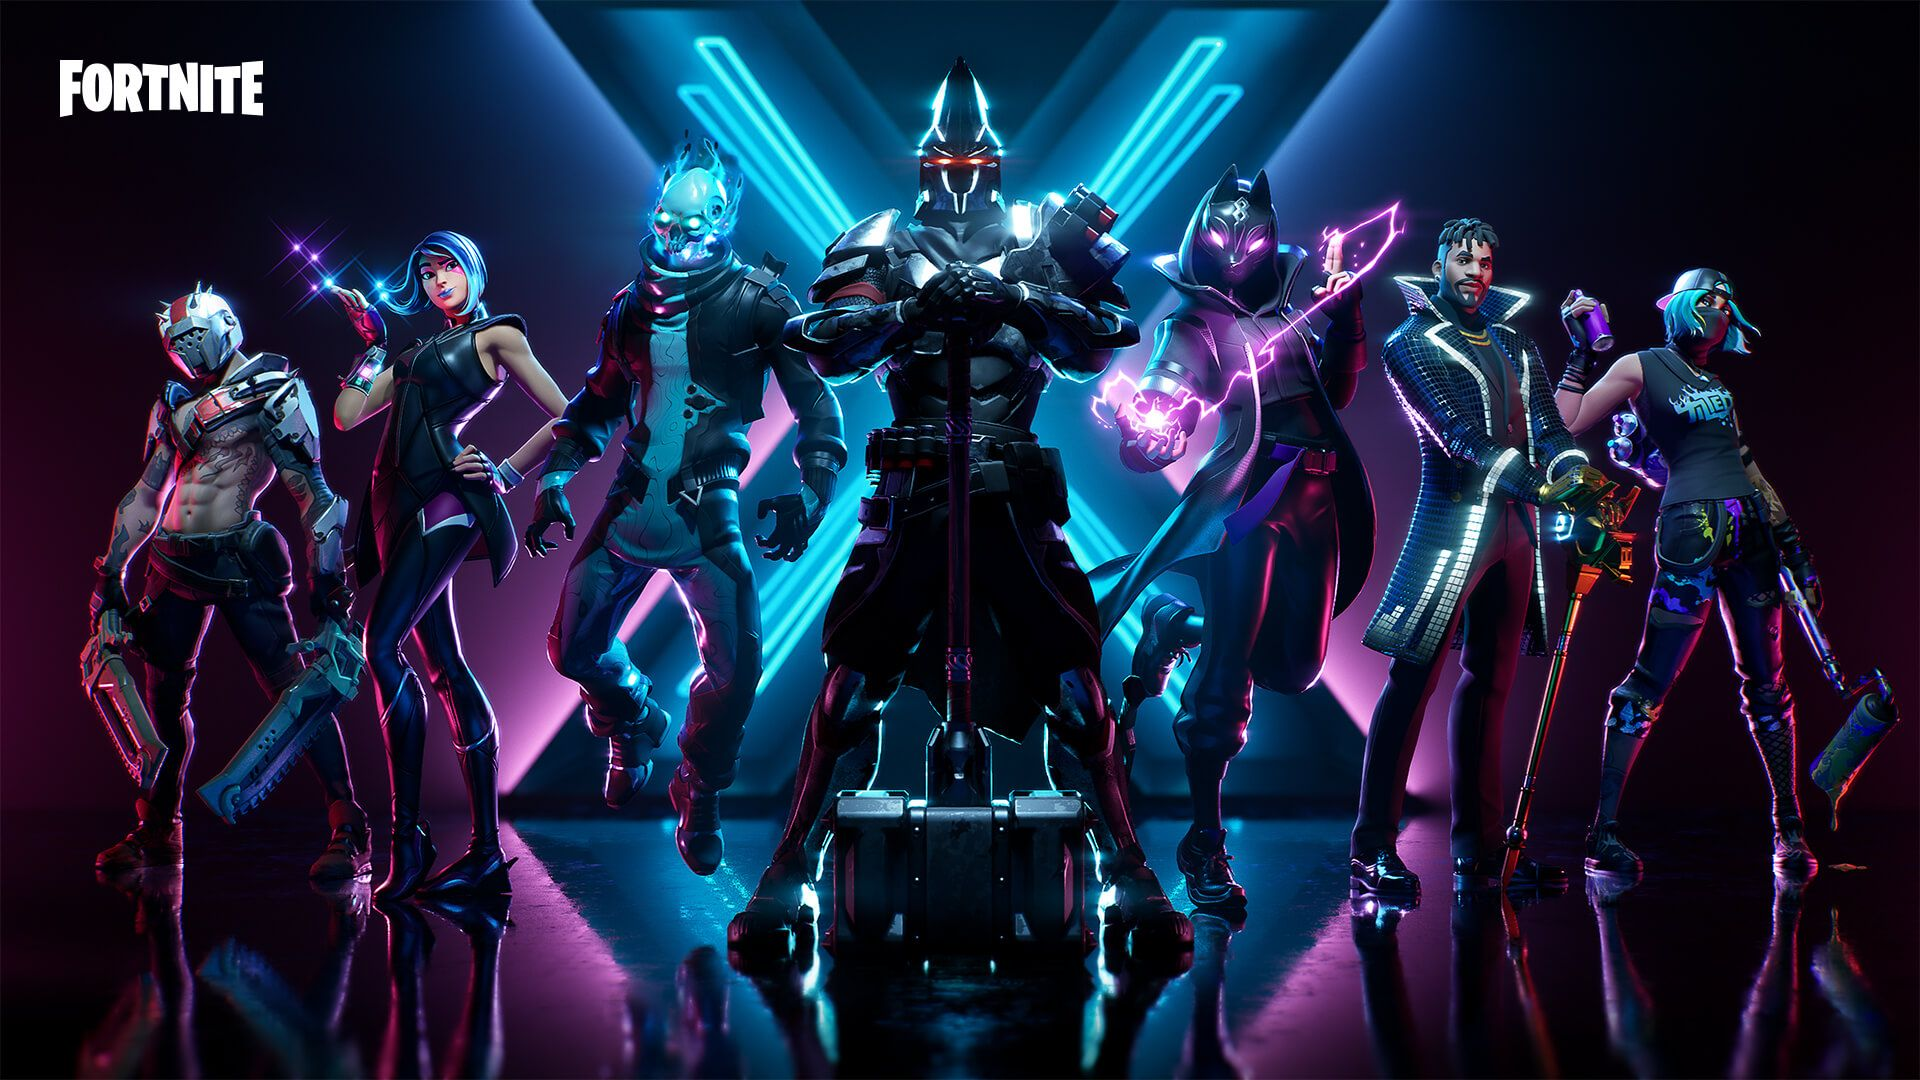 Fortnite How To Tame A Shark In 2020 Fortnite Epic Games Epic Games Fortnite